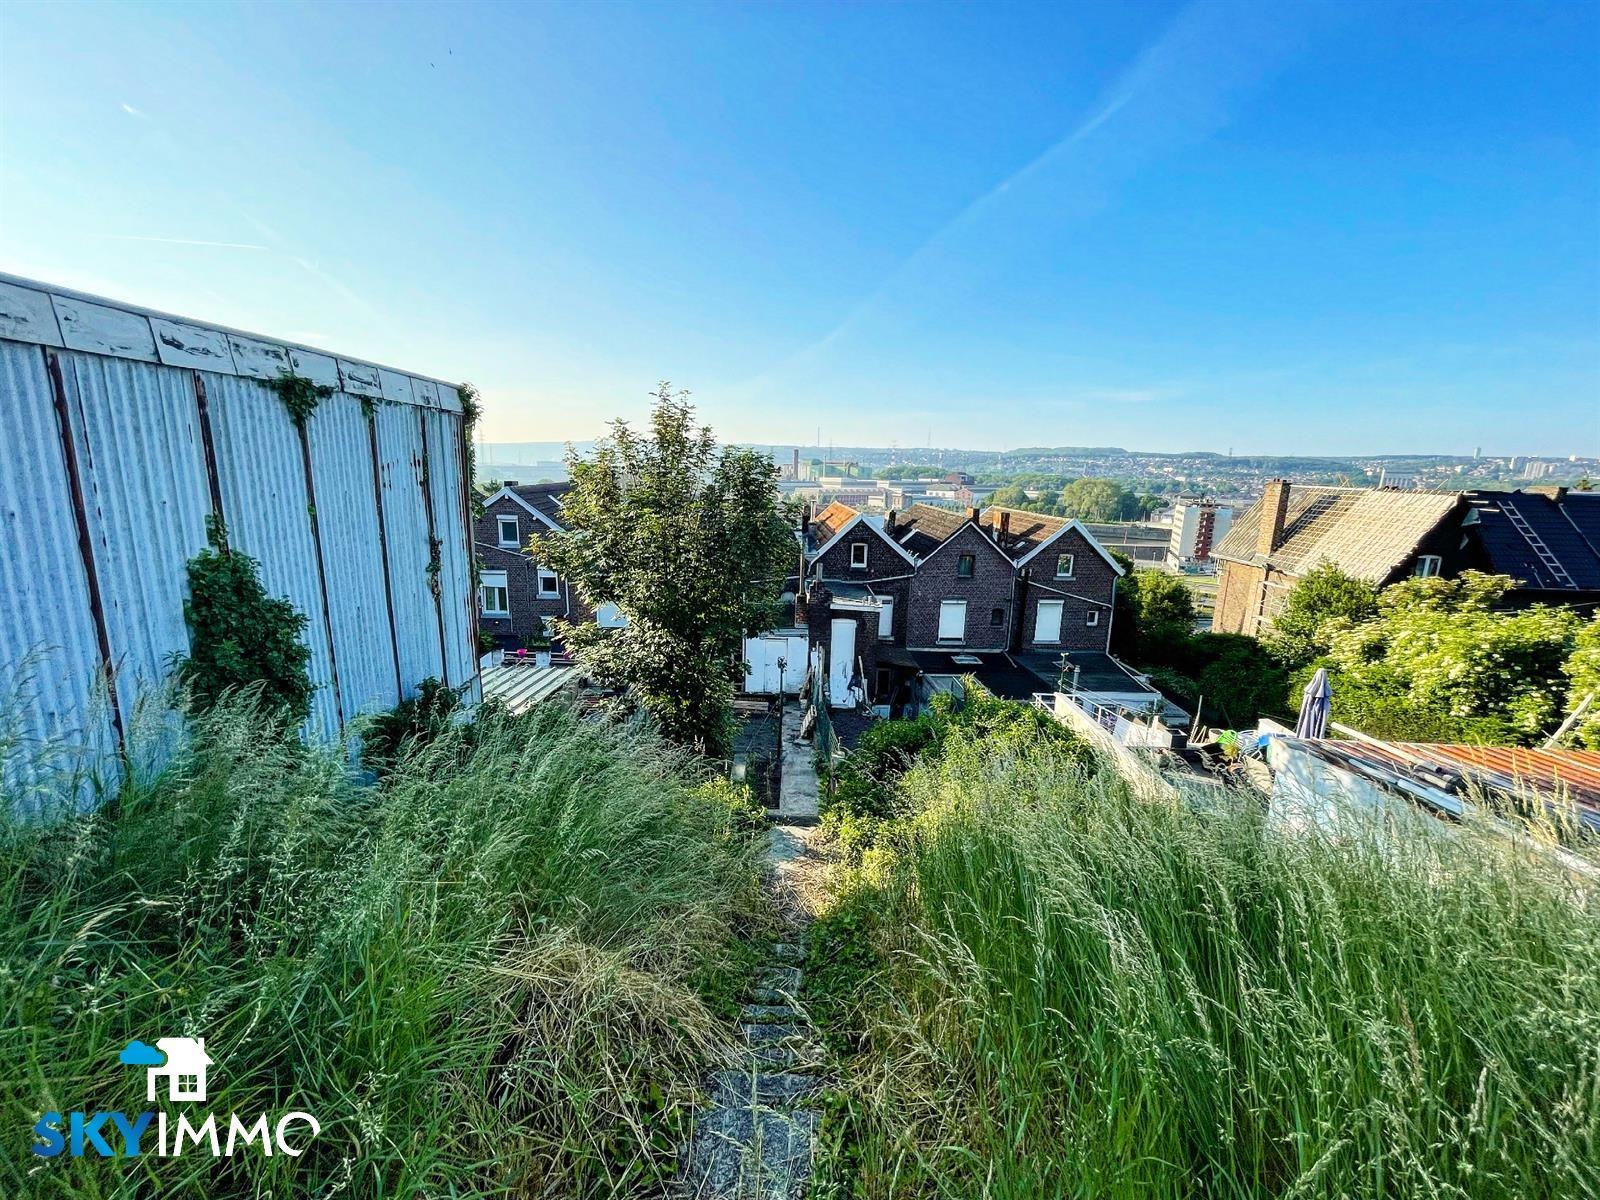 Maison - Seraing Jemeppesur-Meuse - #4383857-12